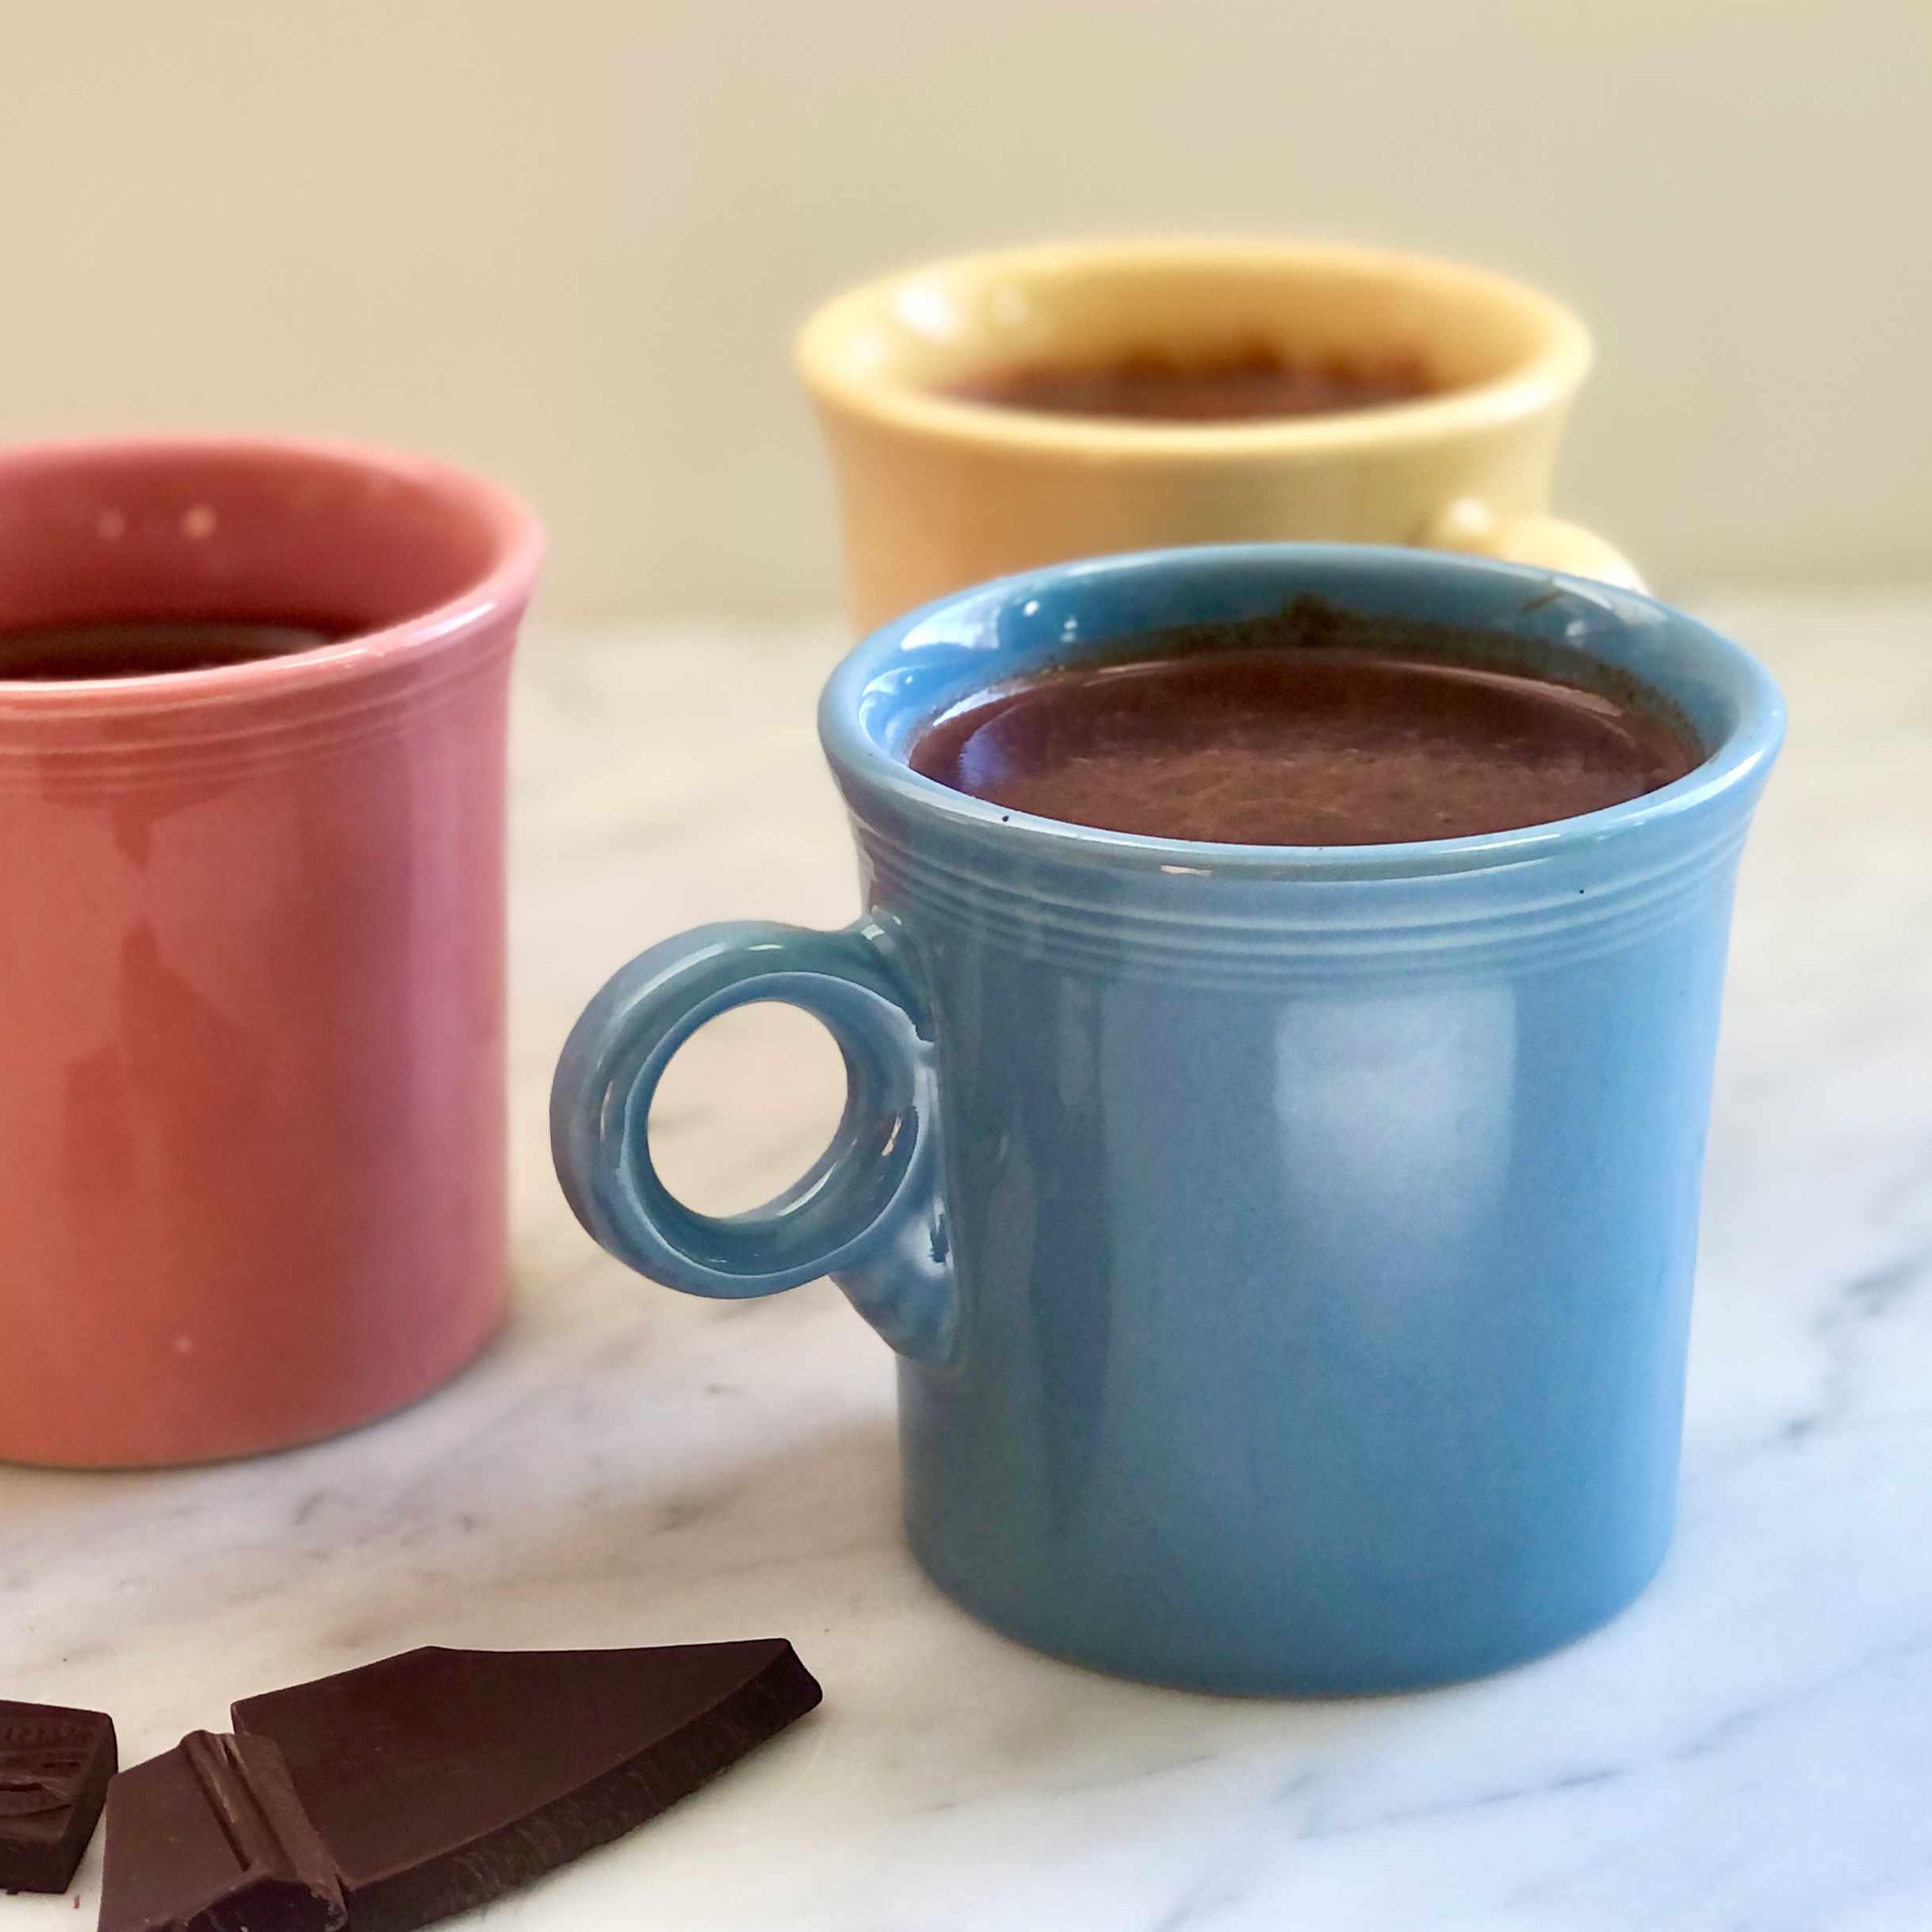 Spanish Hot Chocolate Tester Image